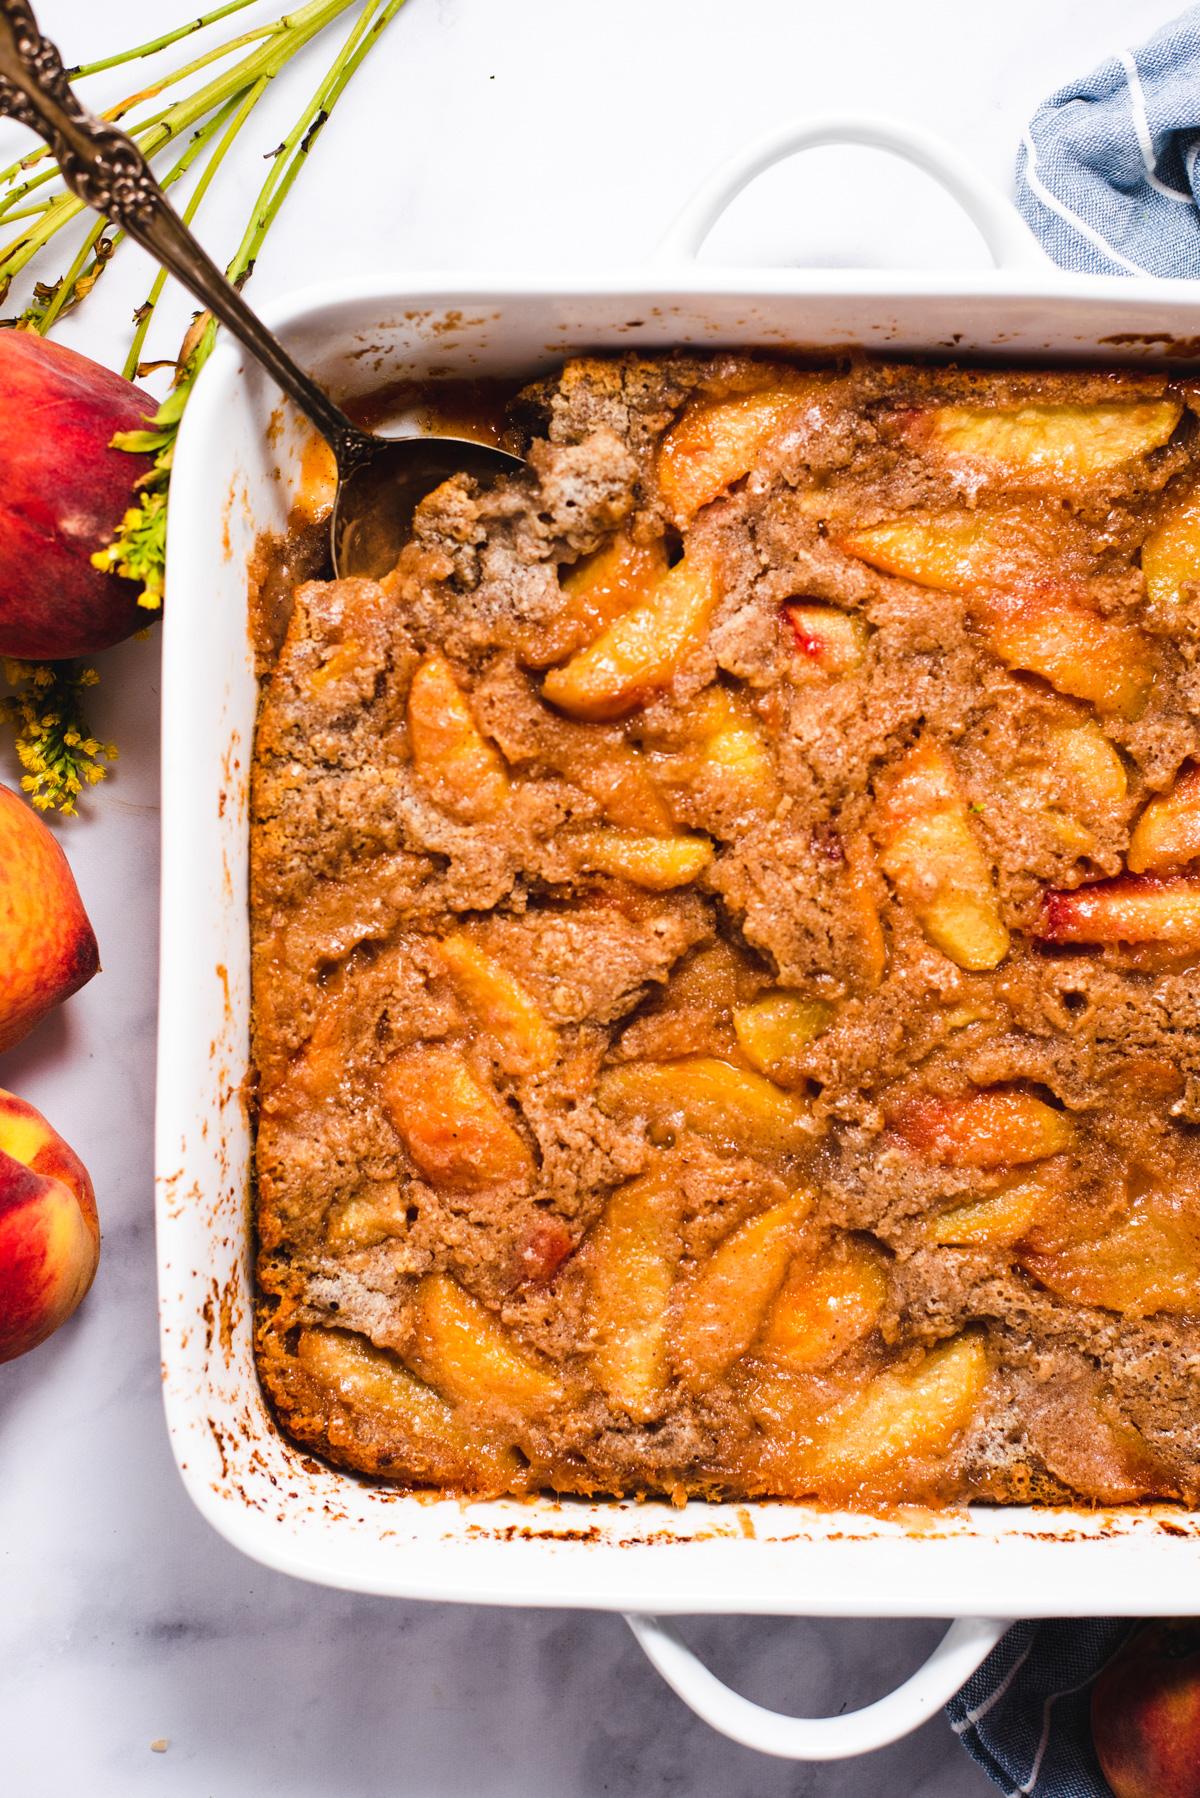 Close up of peach cobbler in white casserole dish